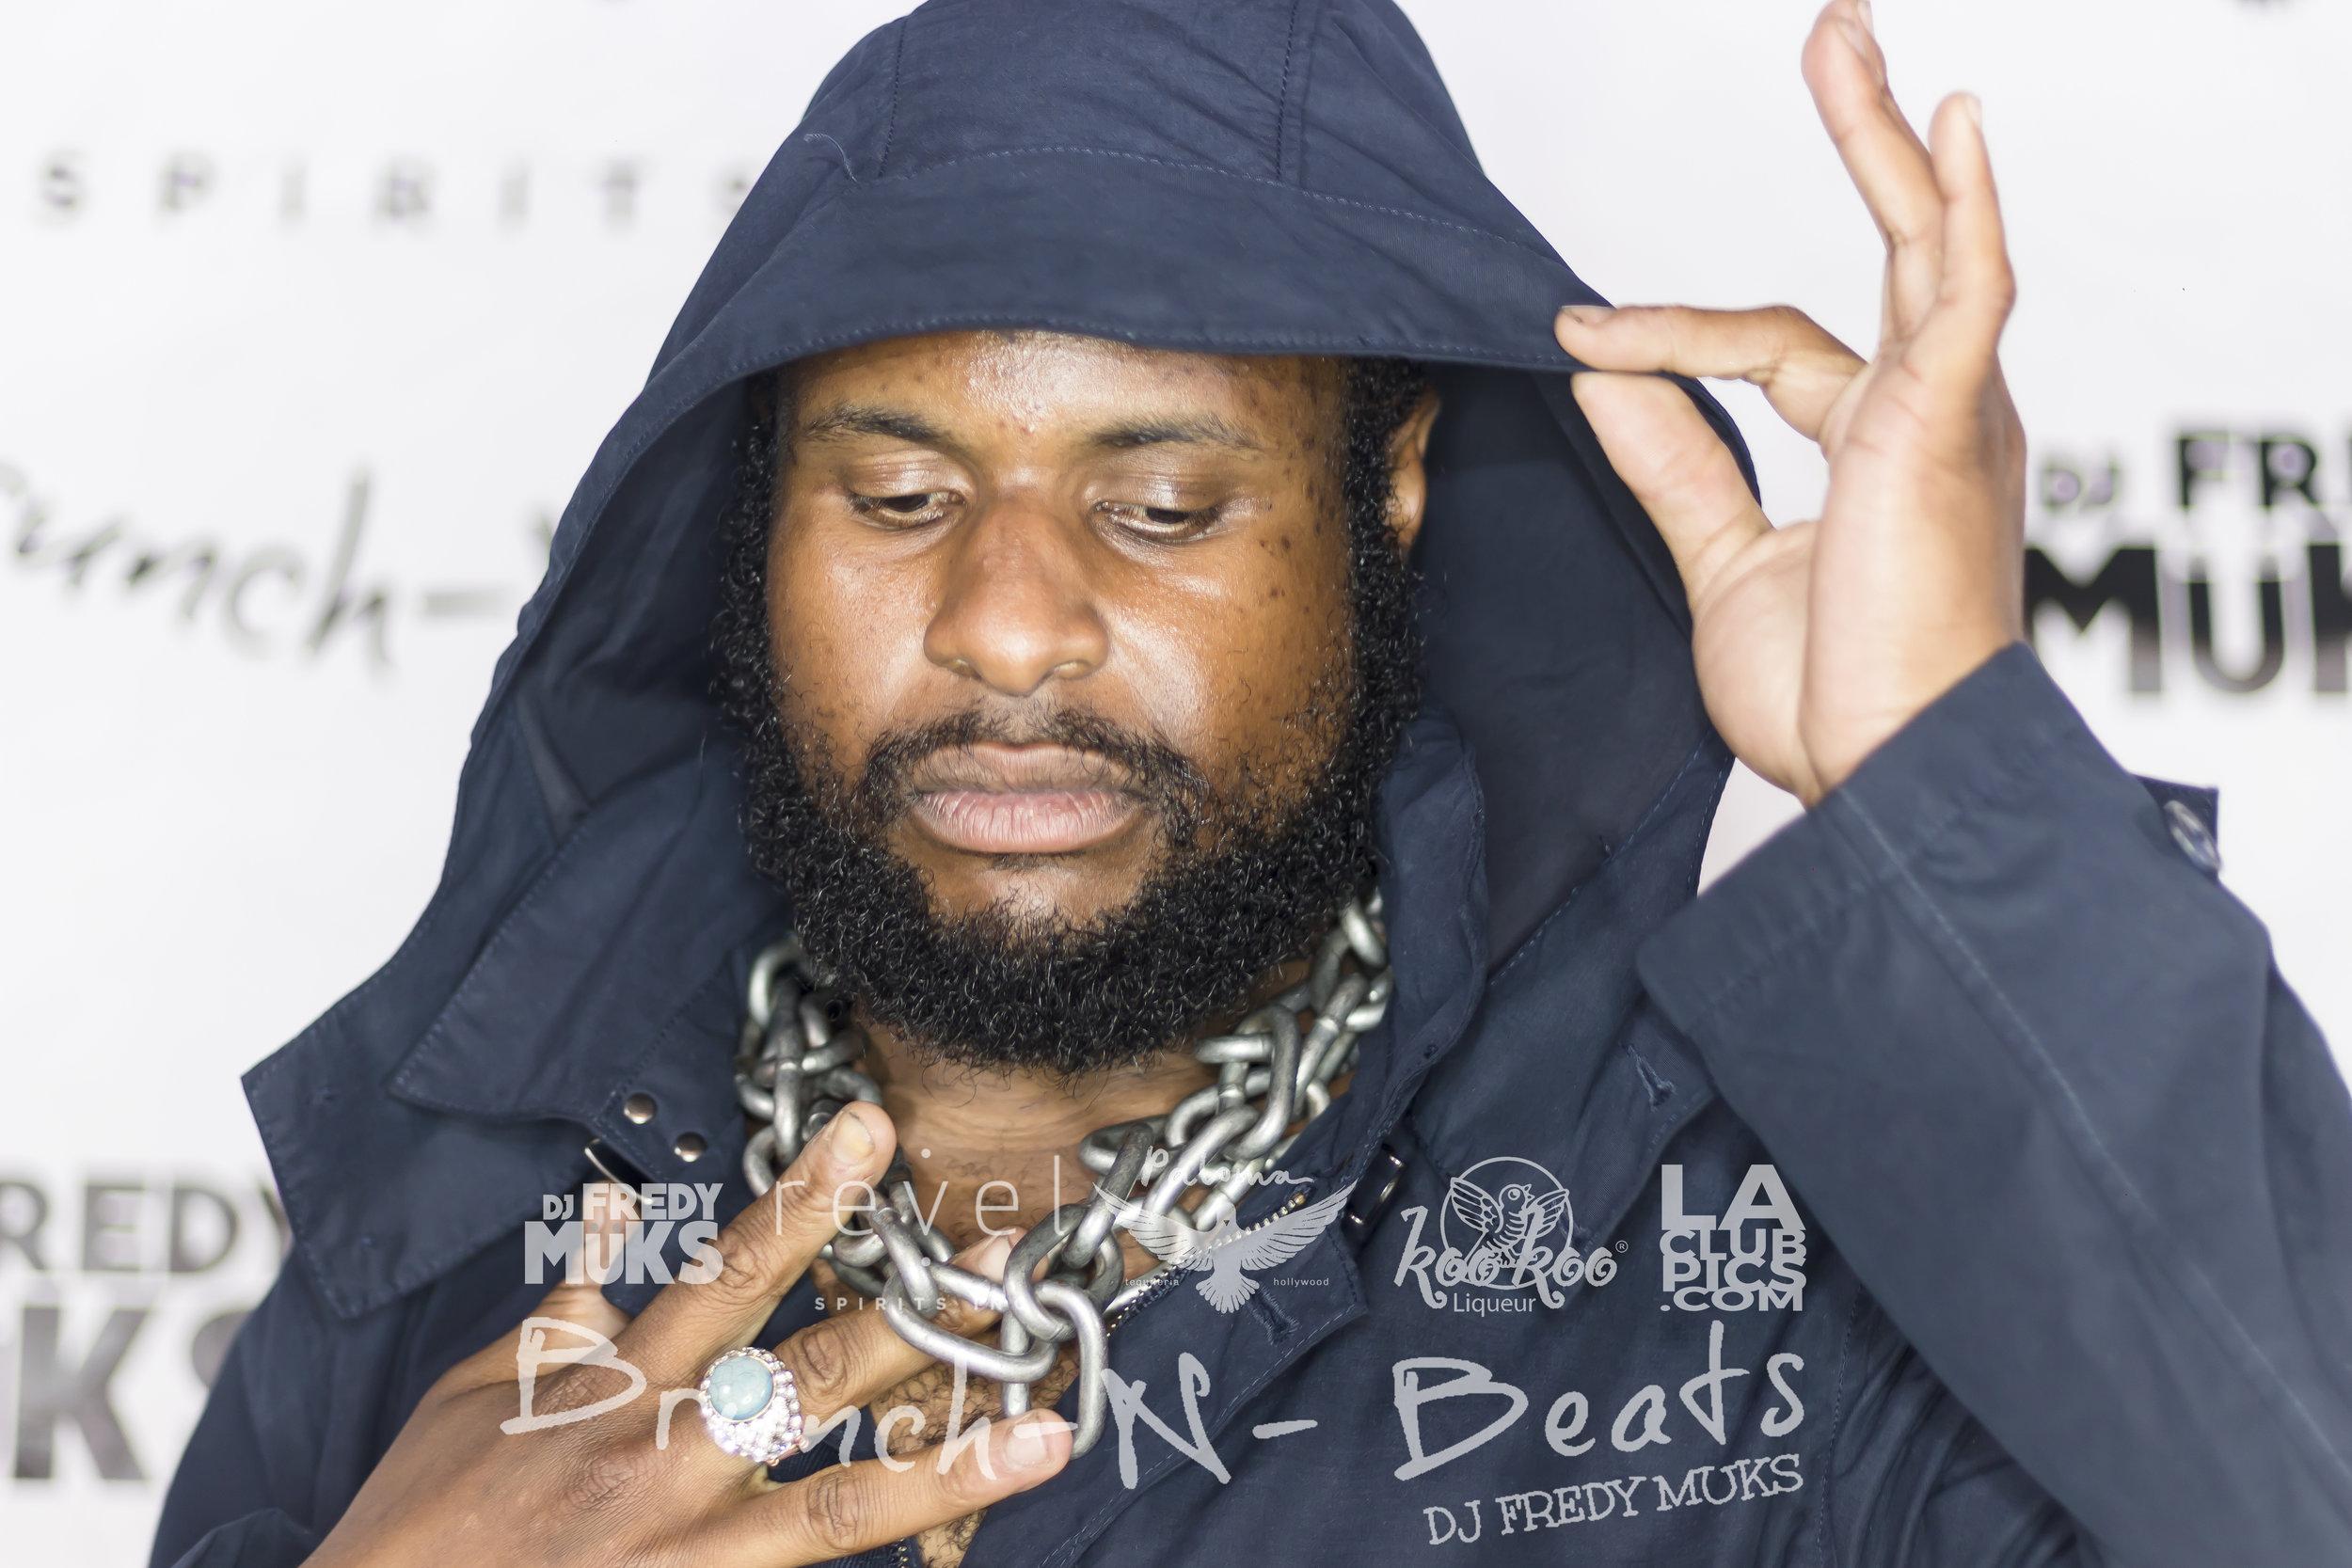 Brunch-N-Beats - 03-11-18_19.jpg